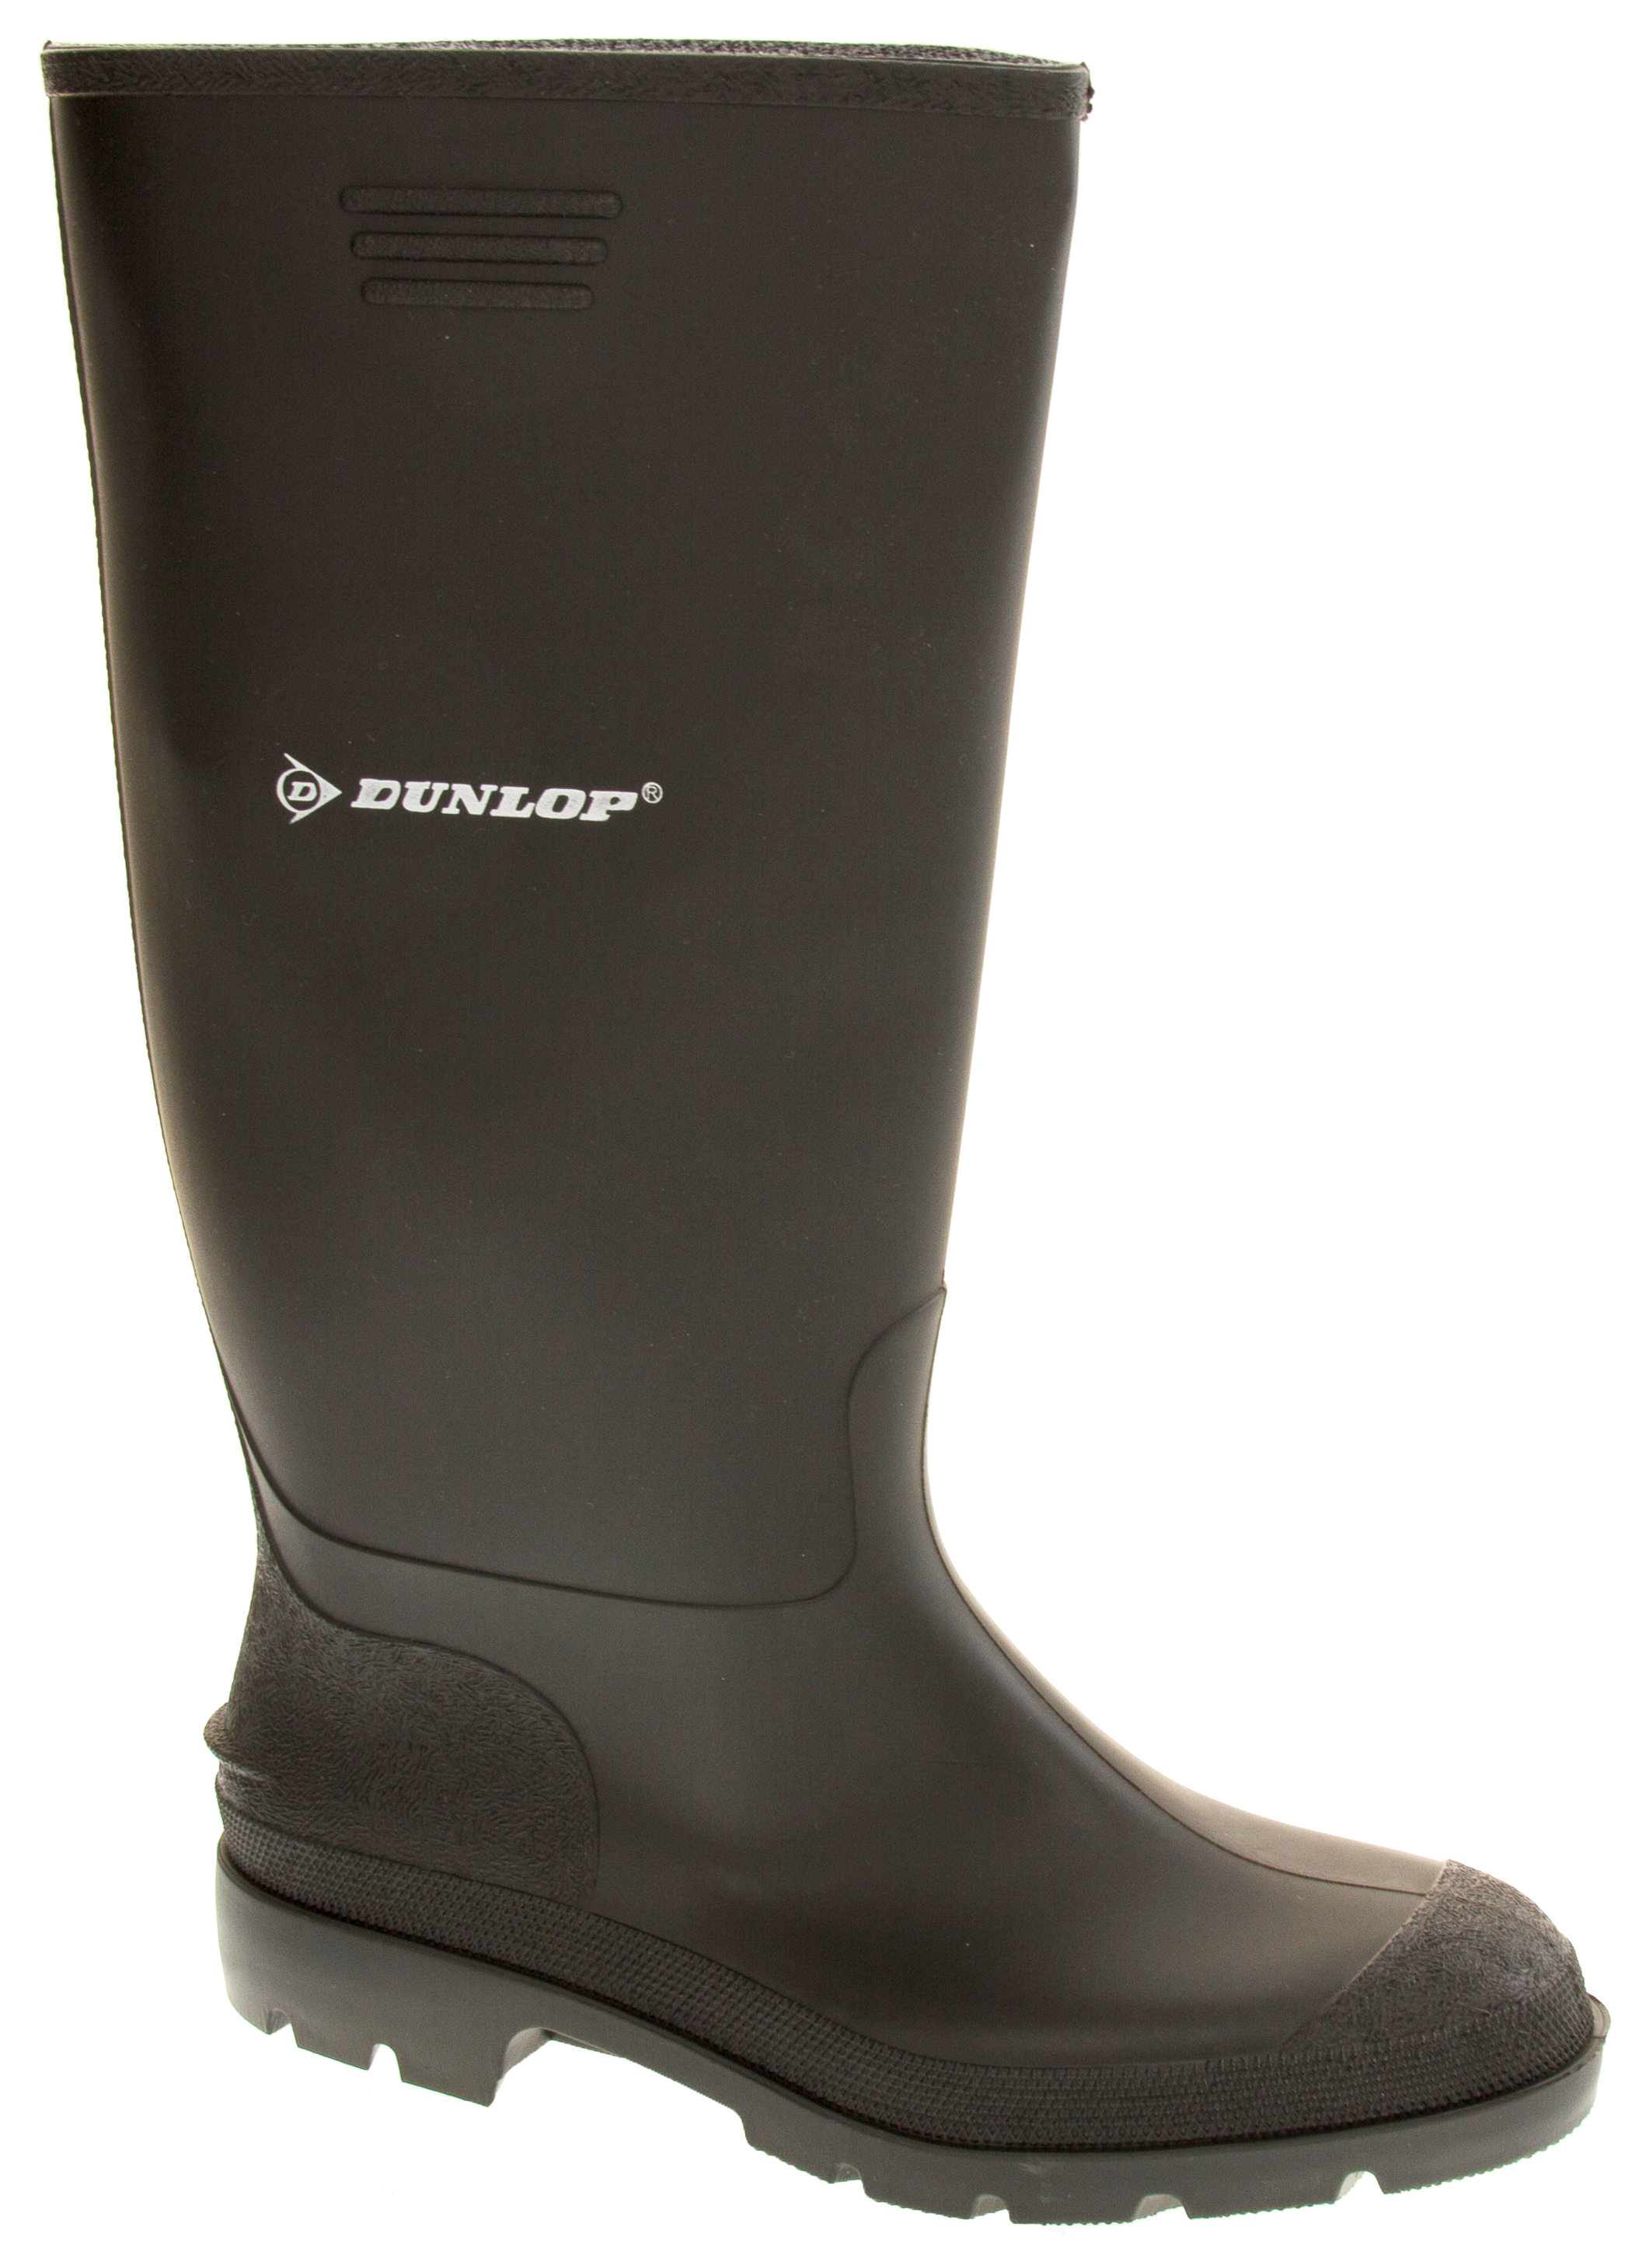 mens dunlop waterproof wellington boots garden boot